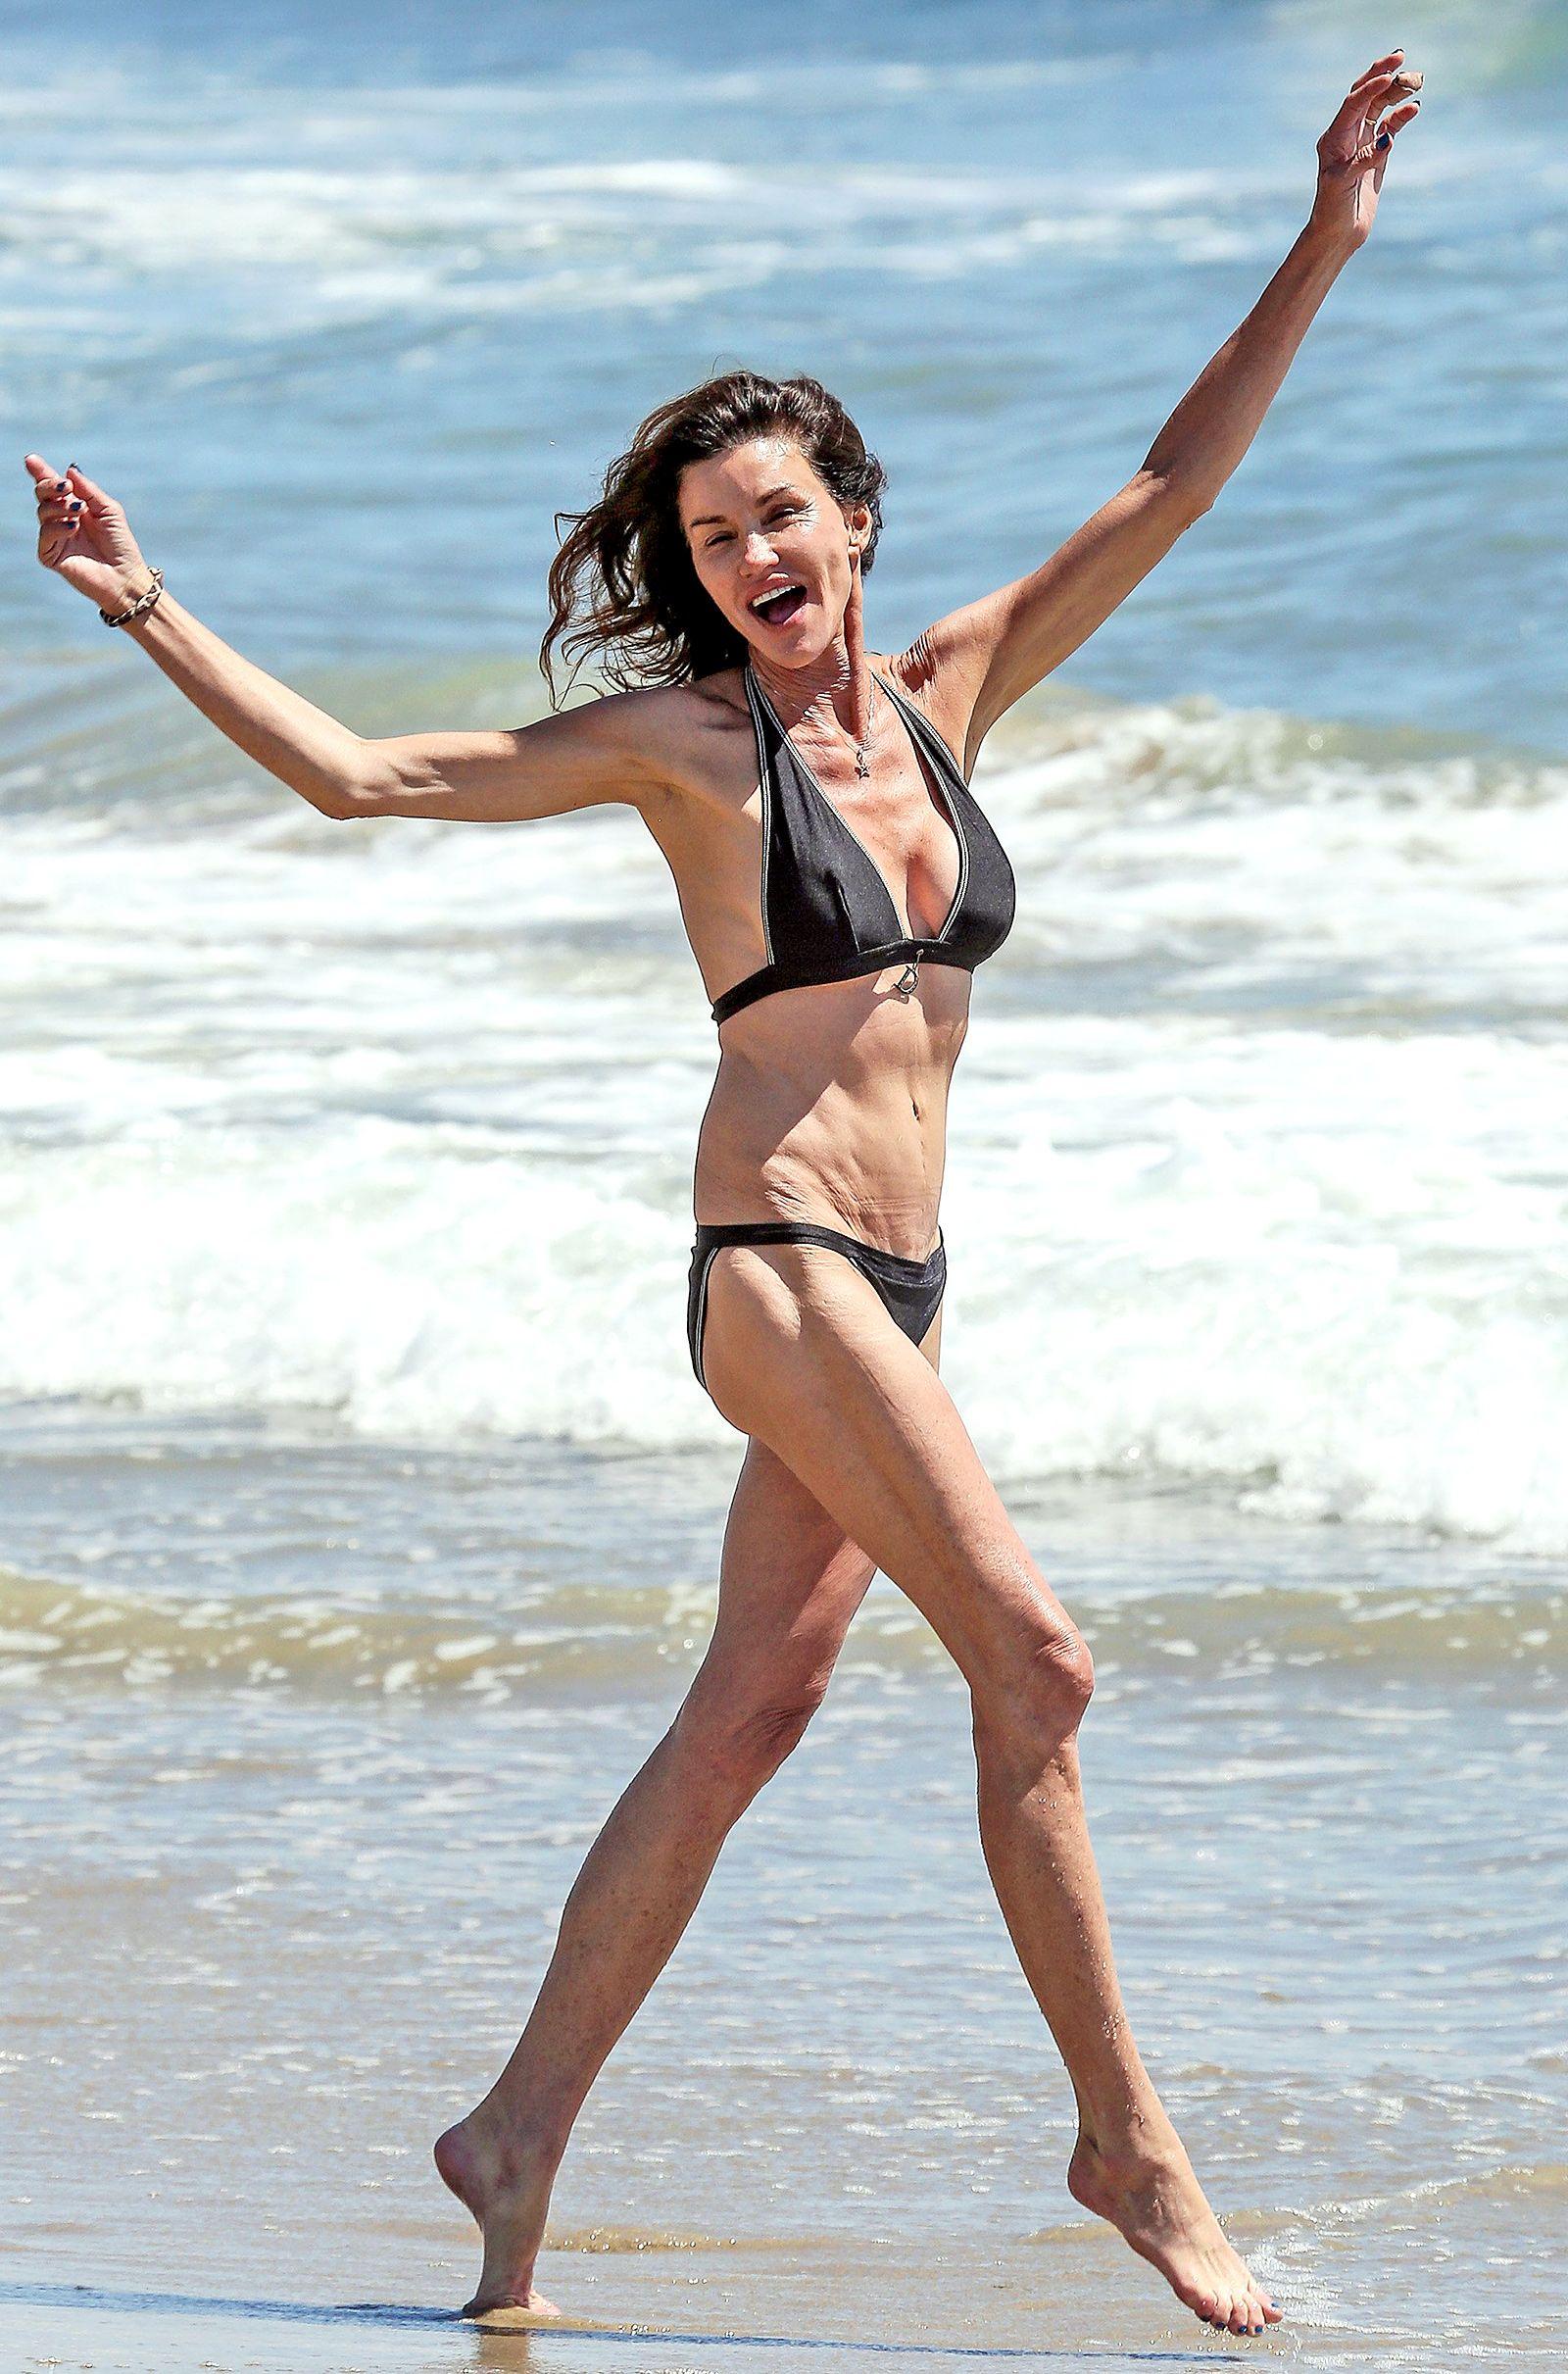 Cleavage Tania Marie Caringi nudes (38 photos), Tits, Leaked, Boobs, see through 2020